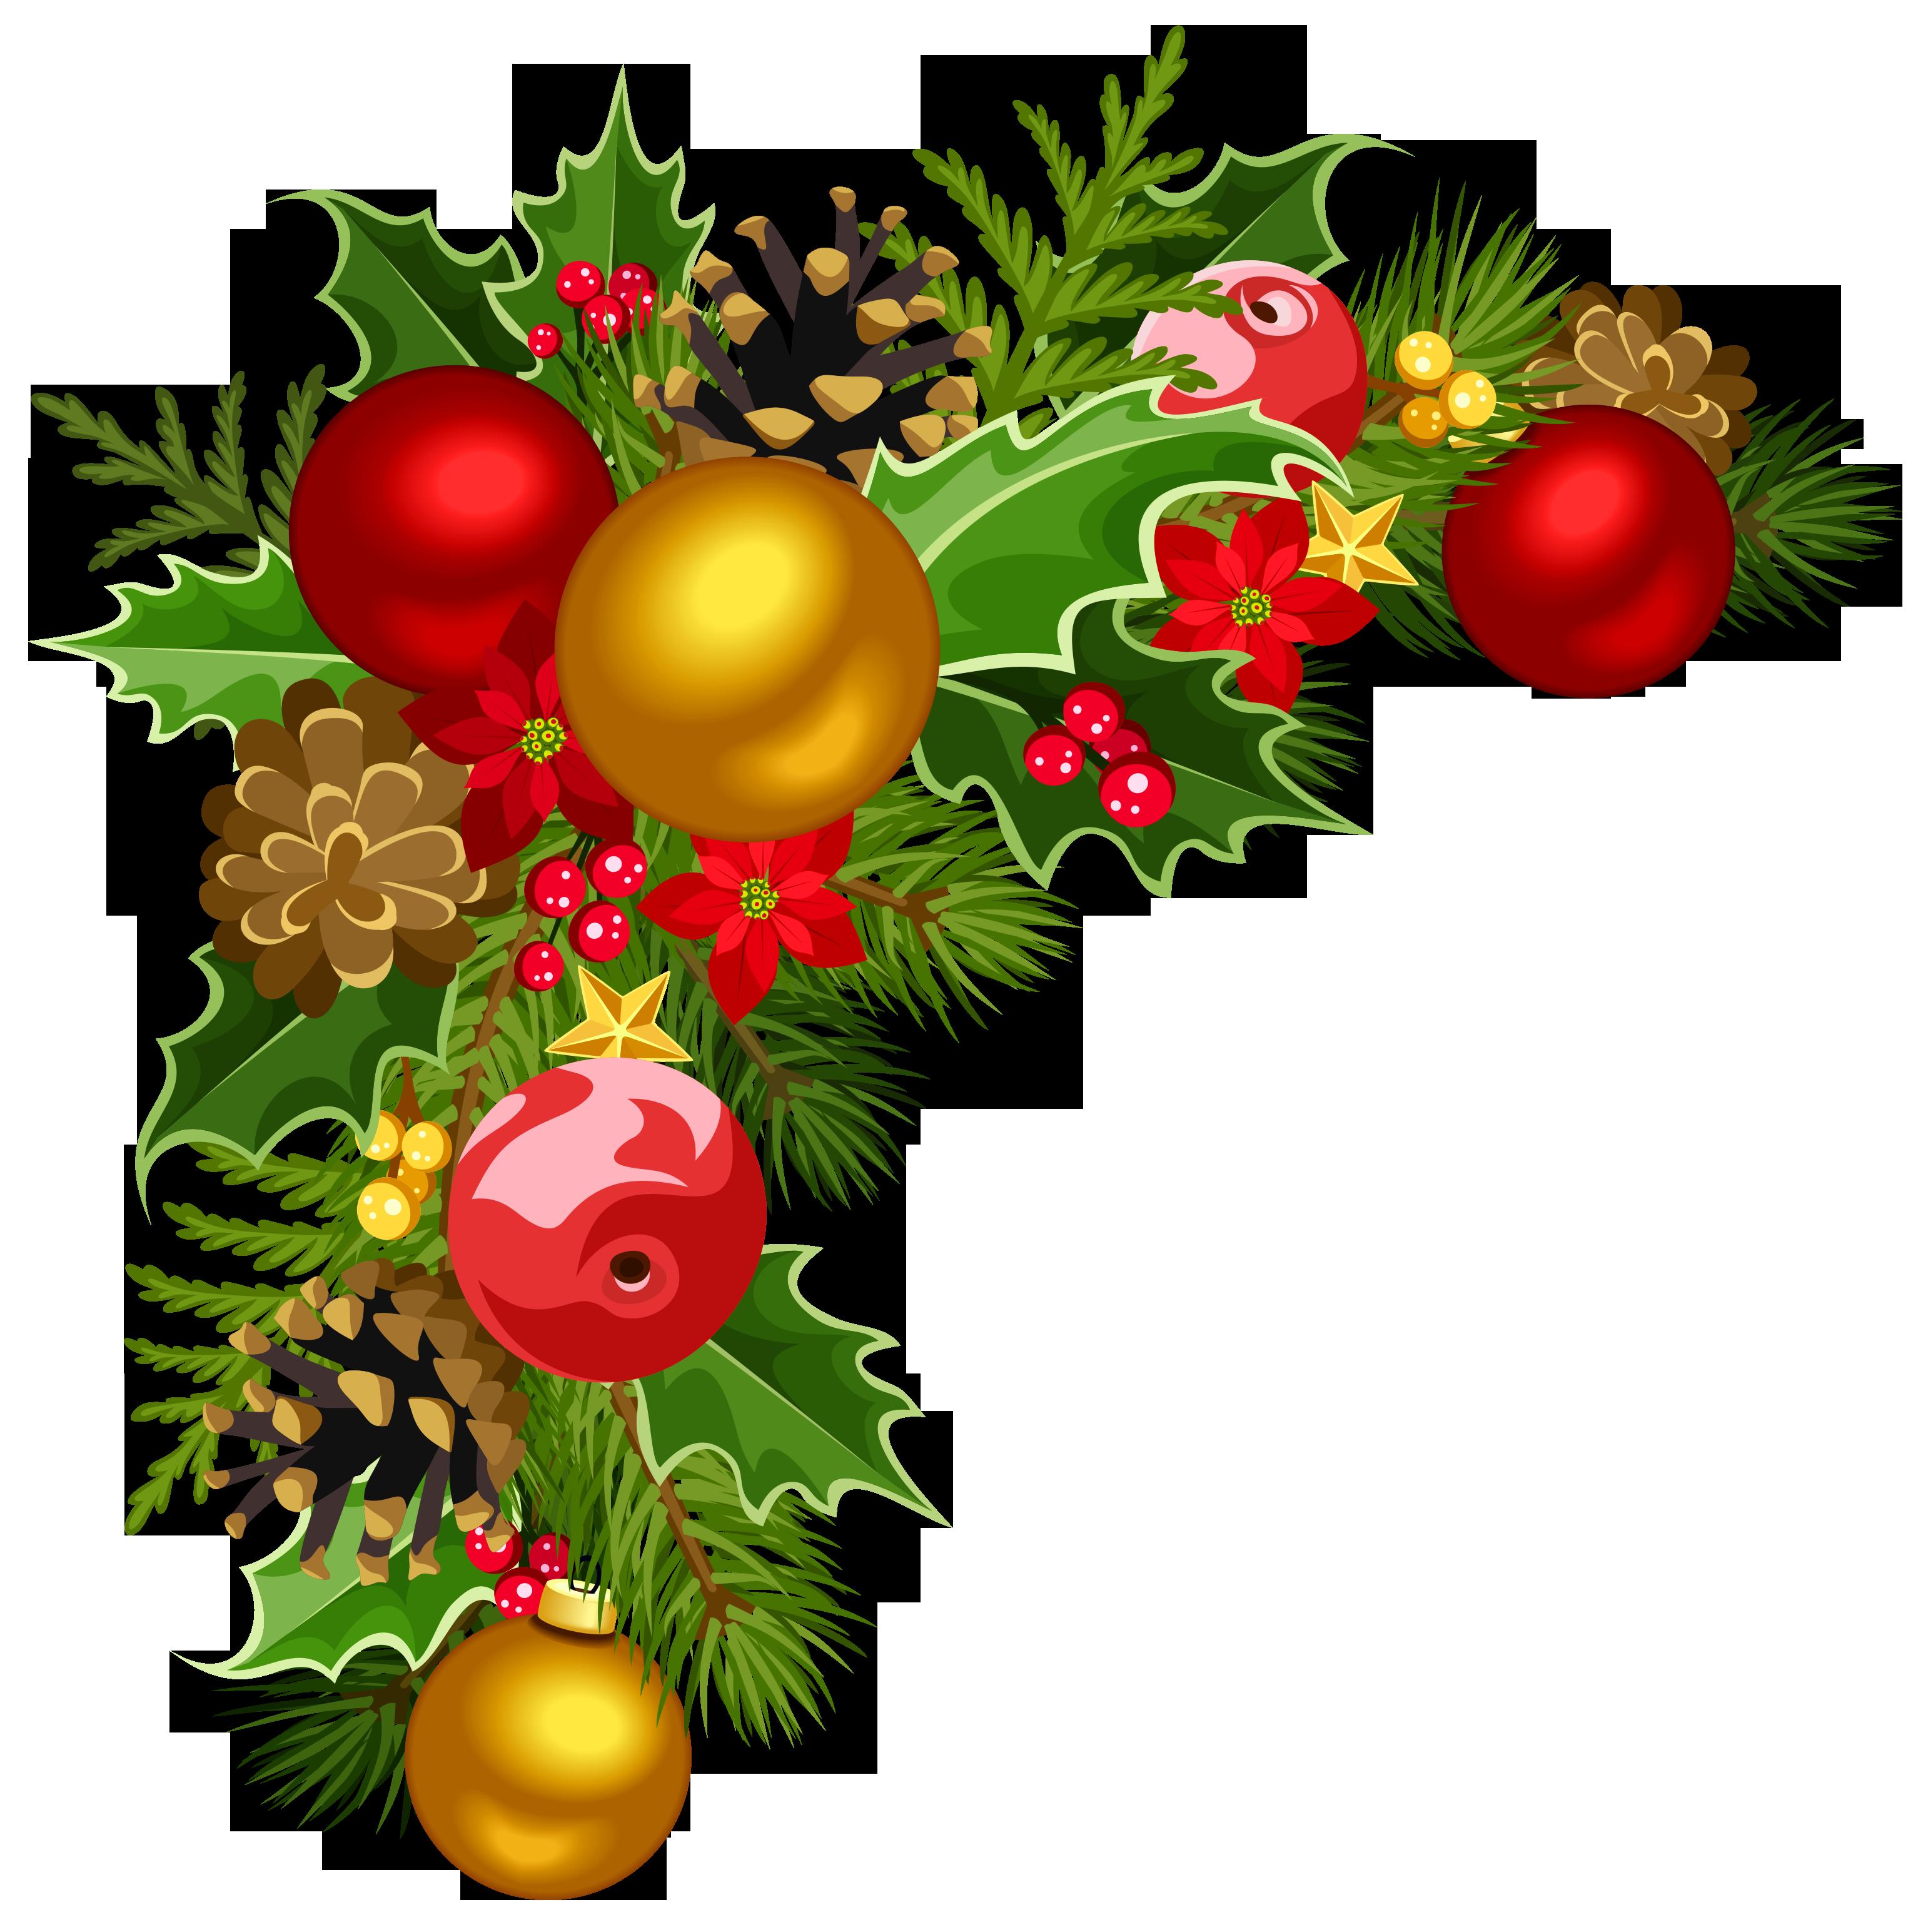 Christmas Decorations Clipart U2013 Happ-Christmas Decorations Clipart u2013 Happy Holidays!-7